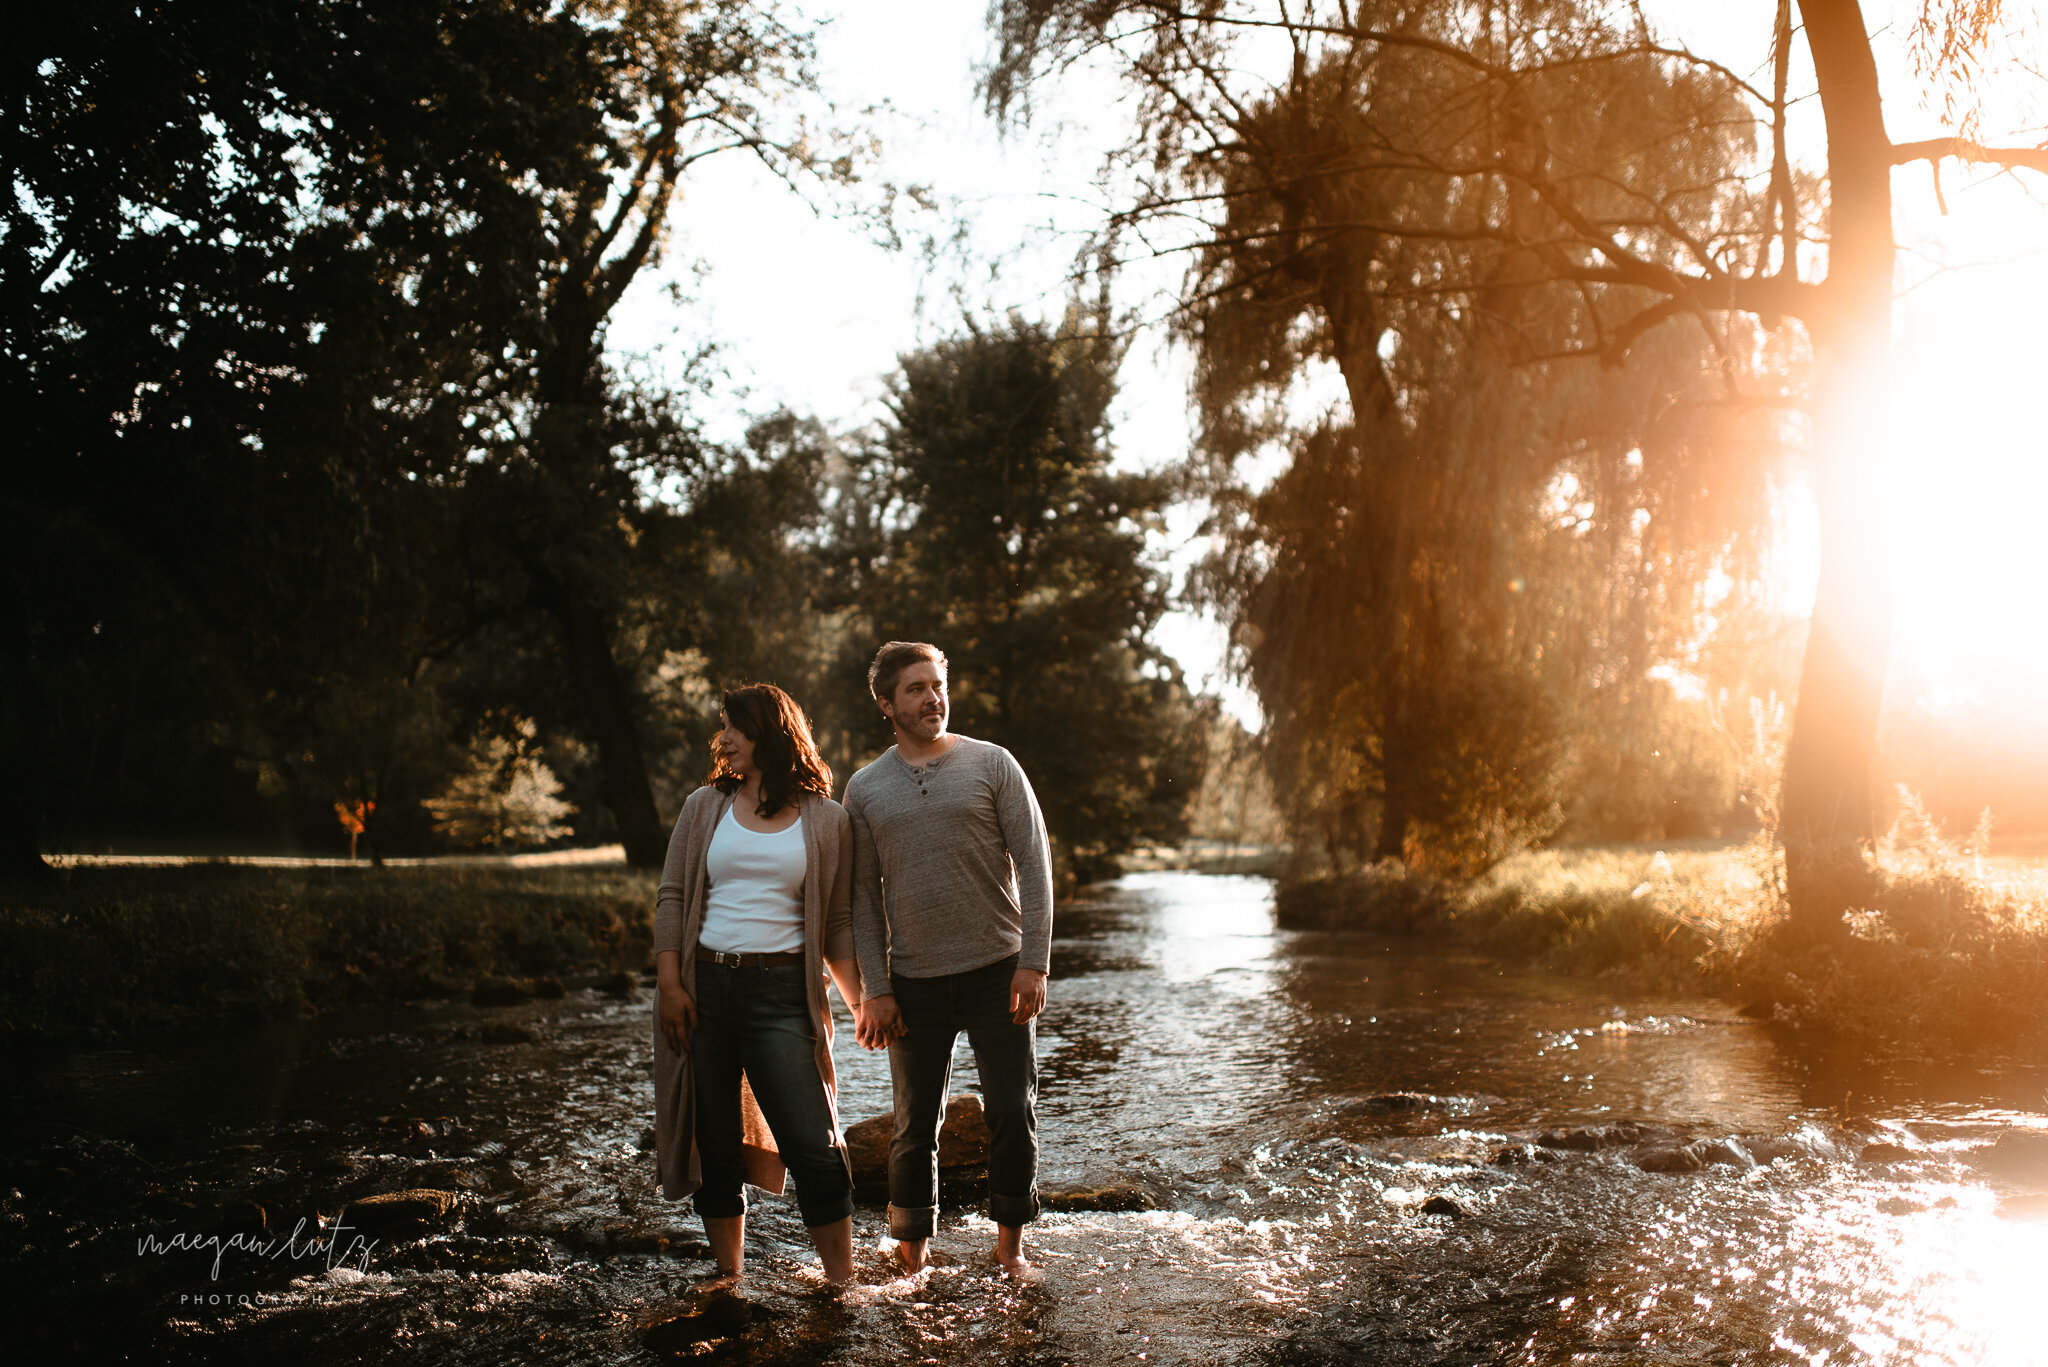 NEPA-Lehigh-Valley-Wedding-Engagement-photographer-at-the-rose-garden-allentown-PA-17.jpg